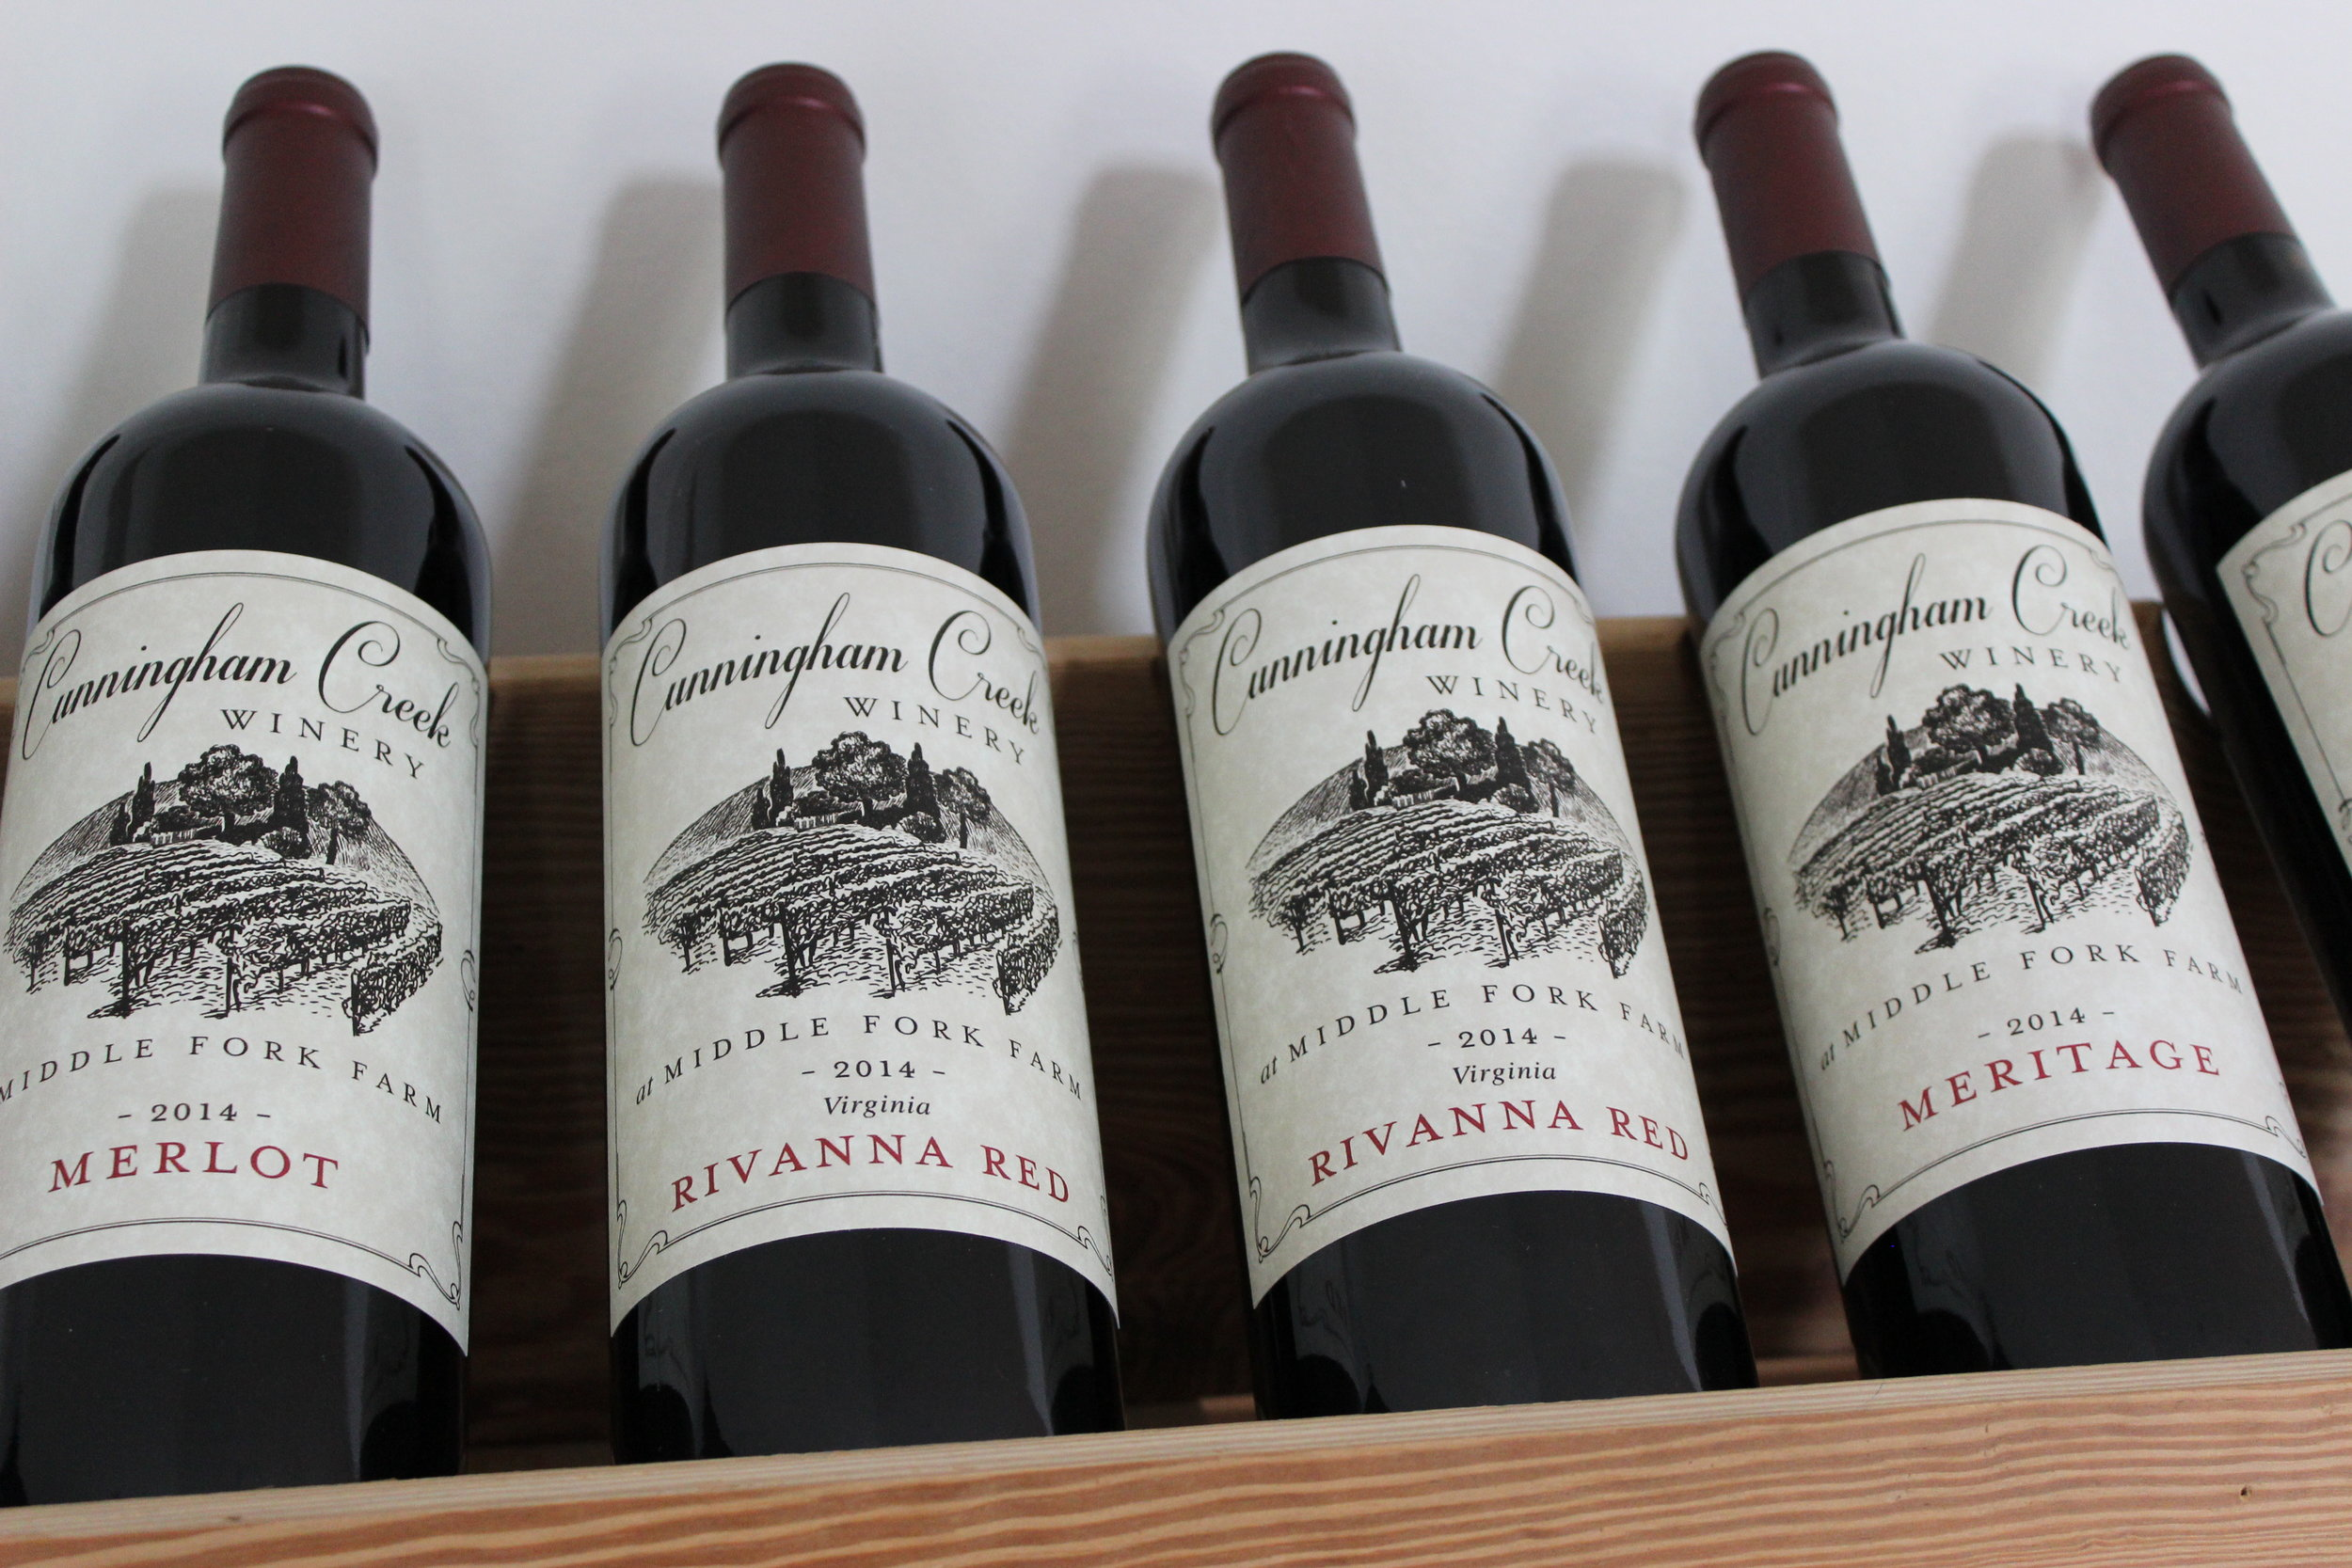 Cunningham Creek Winery